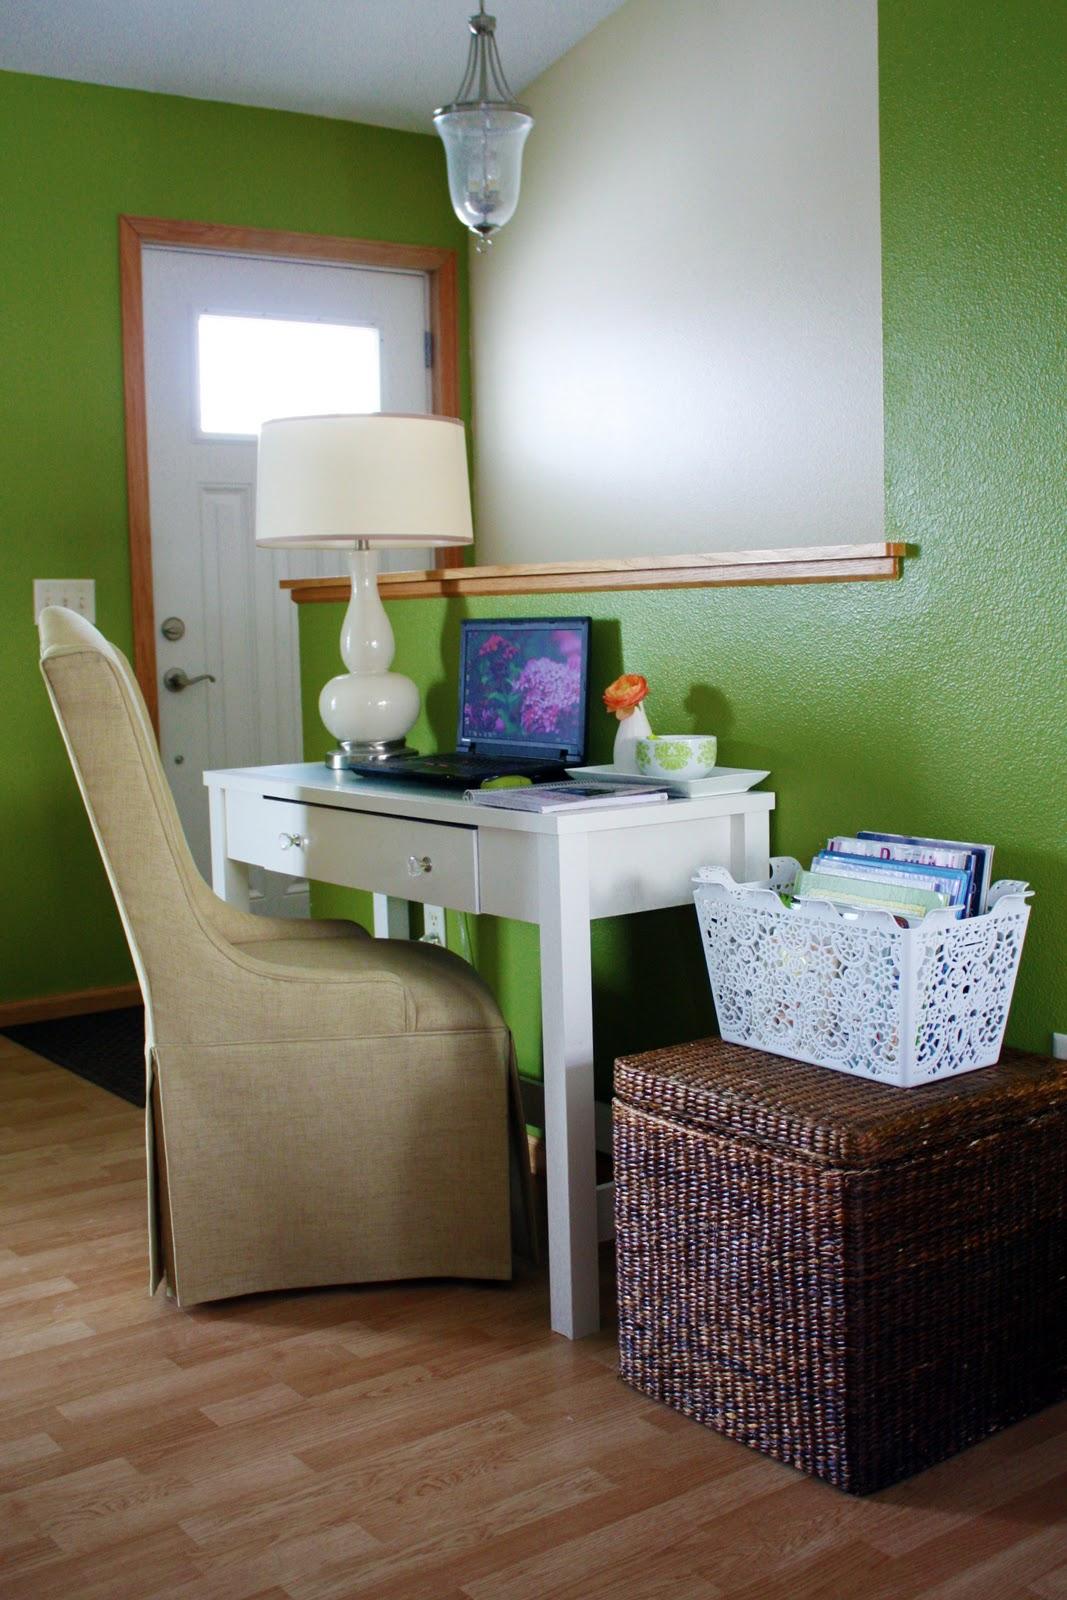 enchanting living room computer desk | IHeart Organizing: Tray Bien